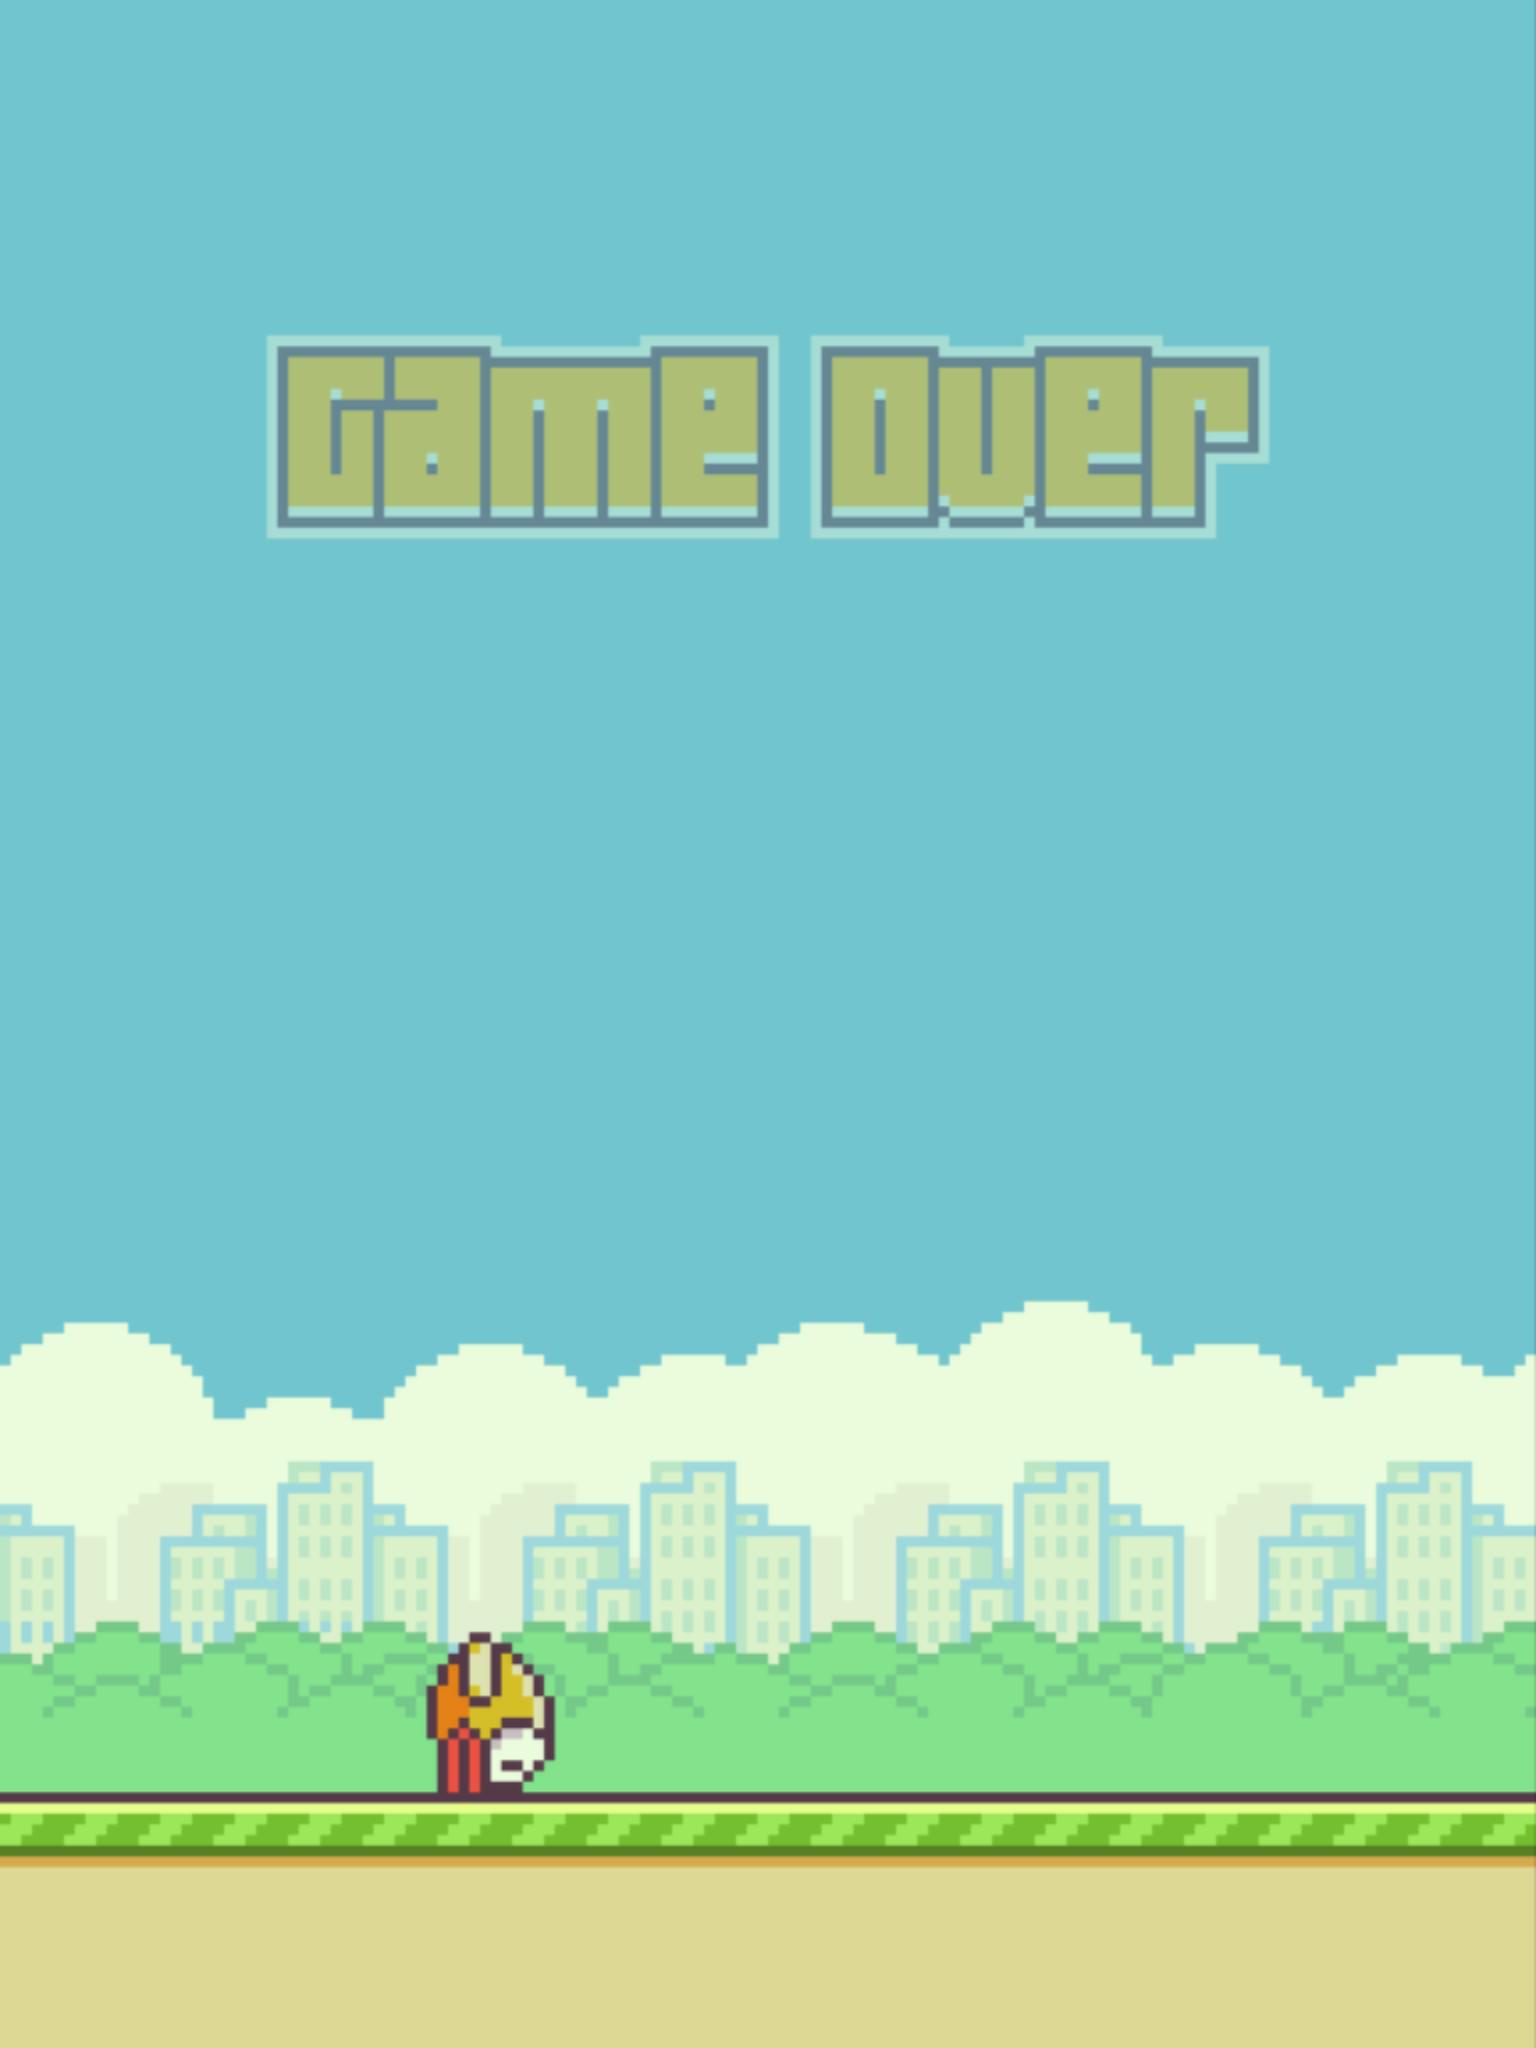 Flappy Bird in his Natural Habitat